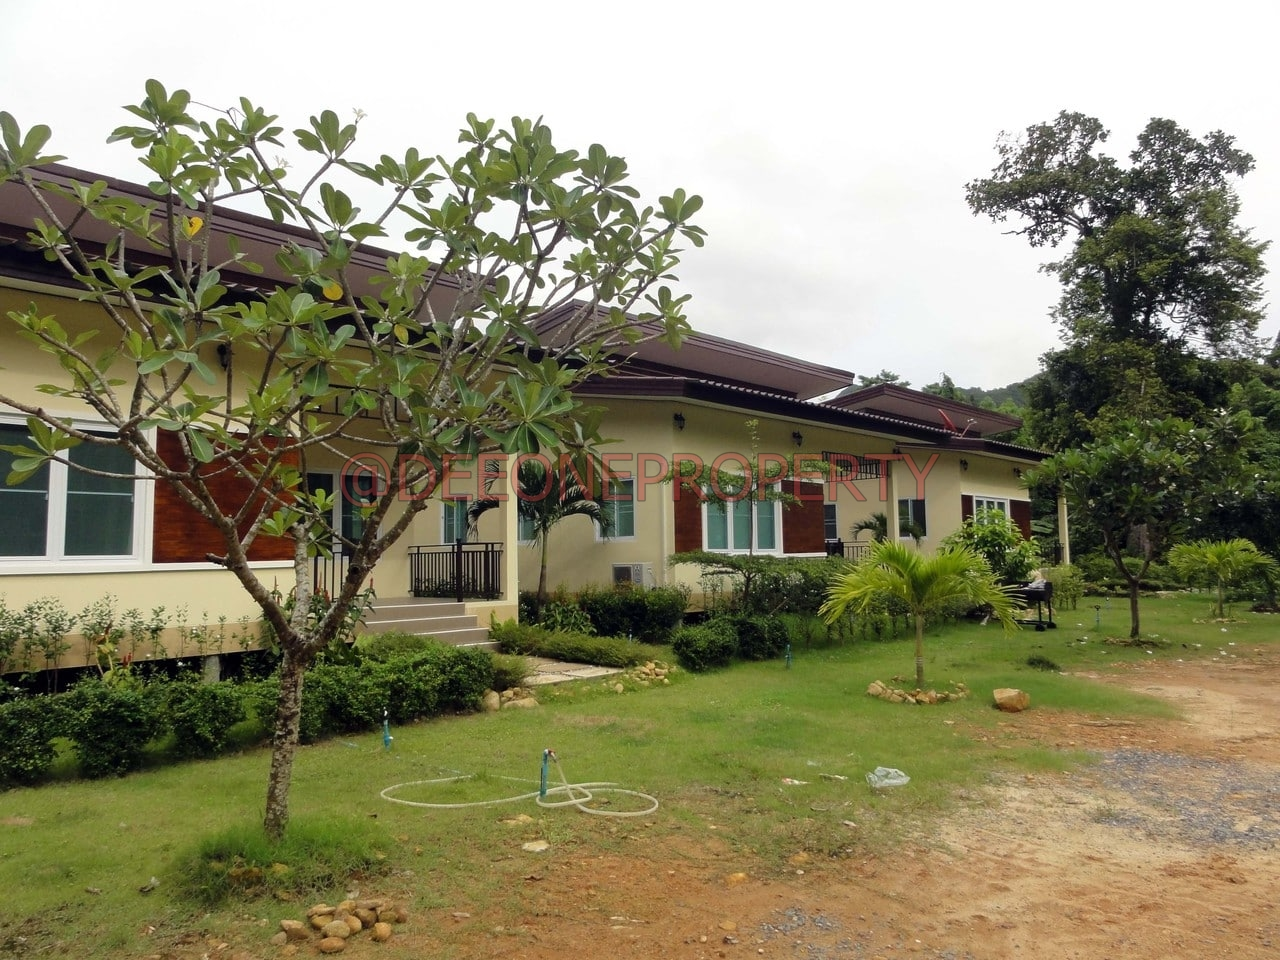 Maison Neuve Vendre Klong Prao Koh Chang